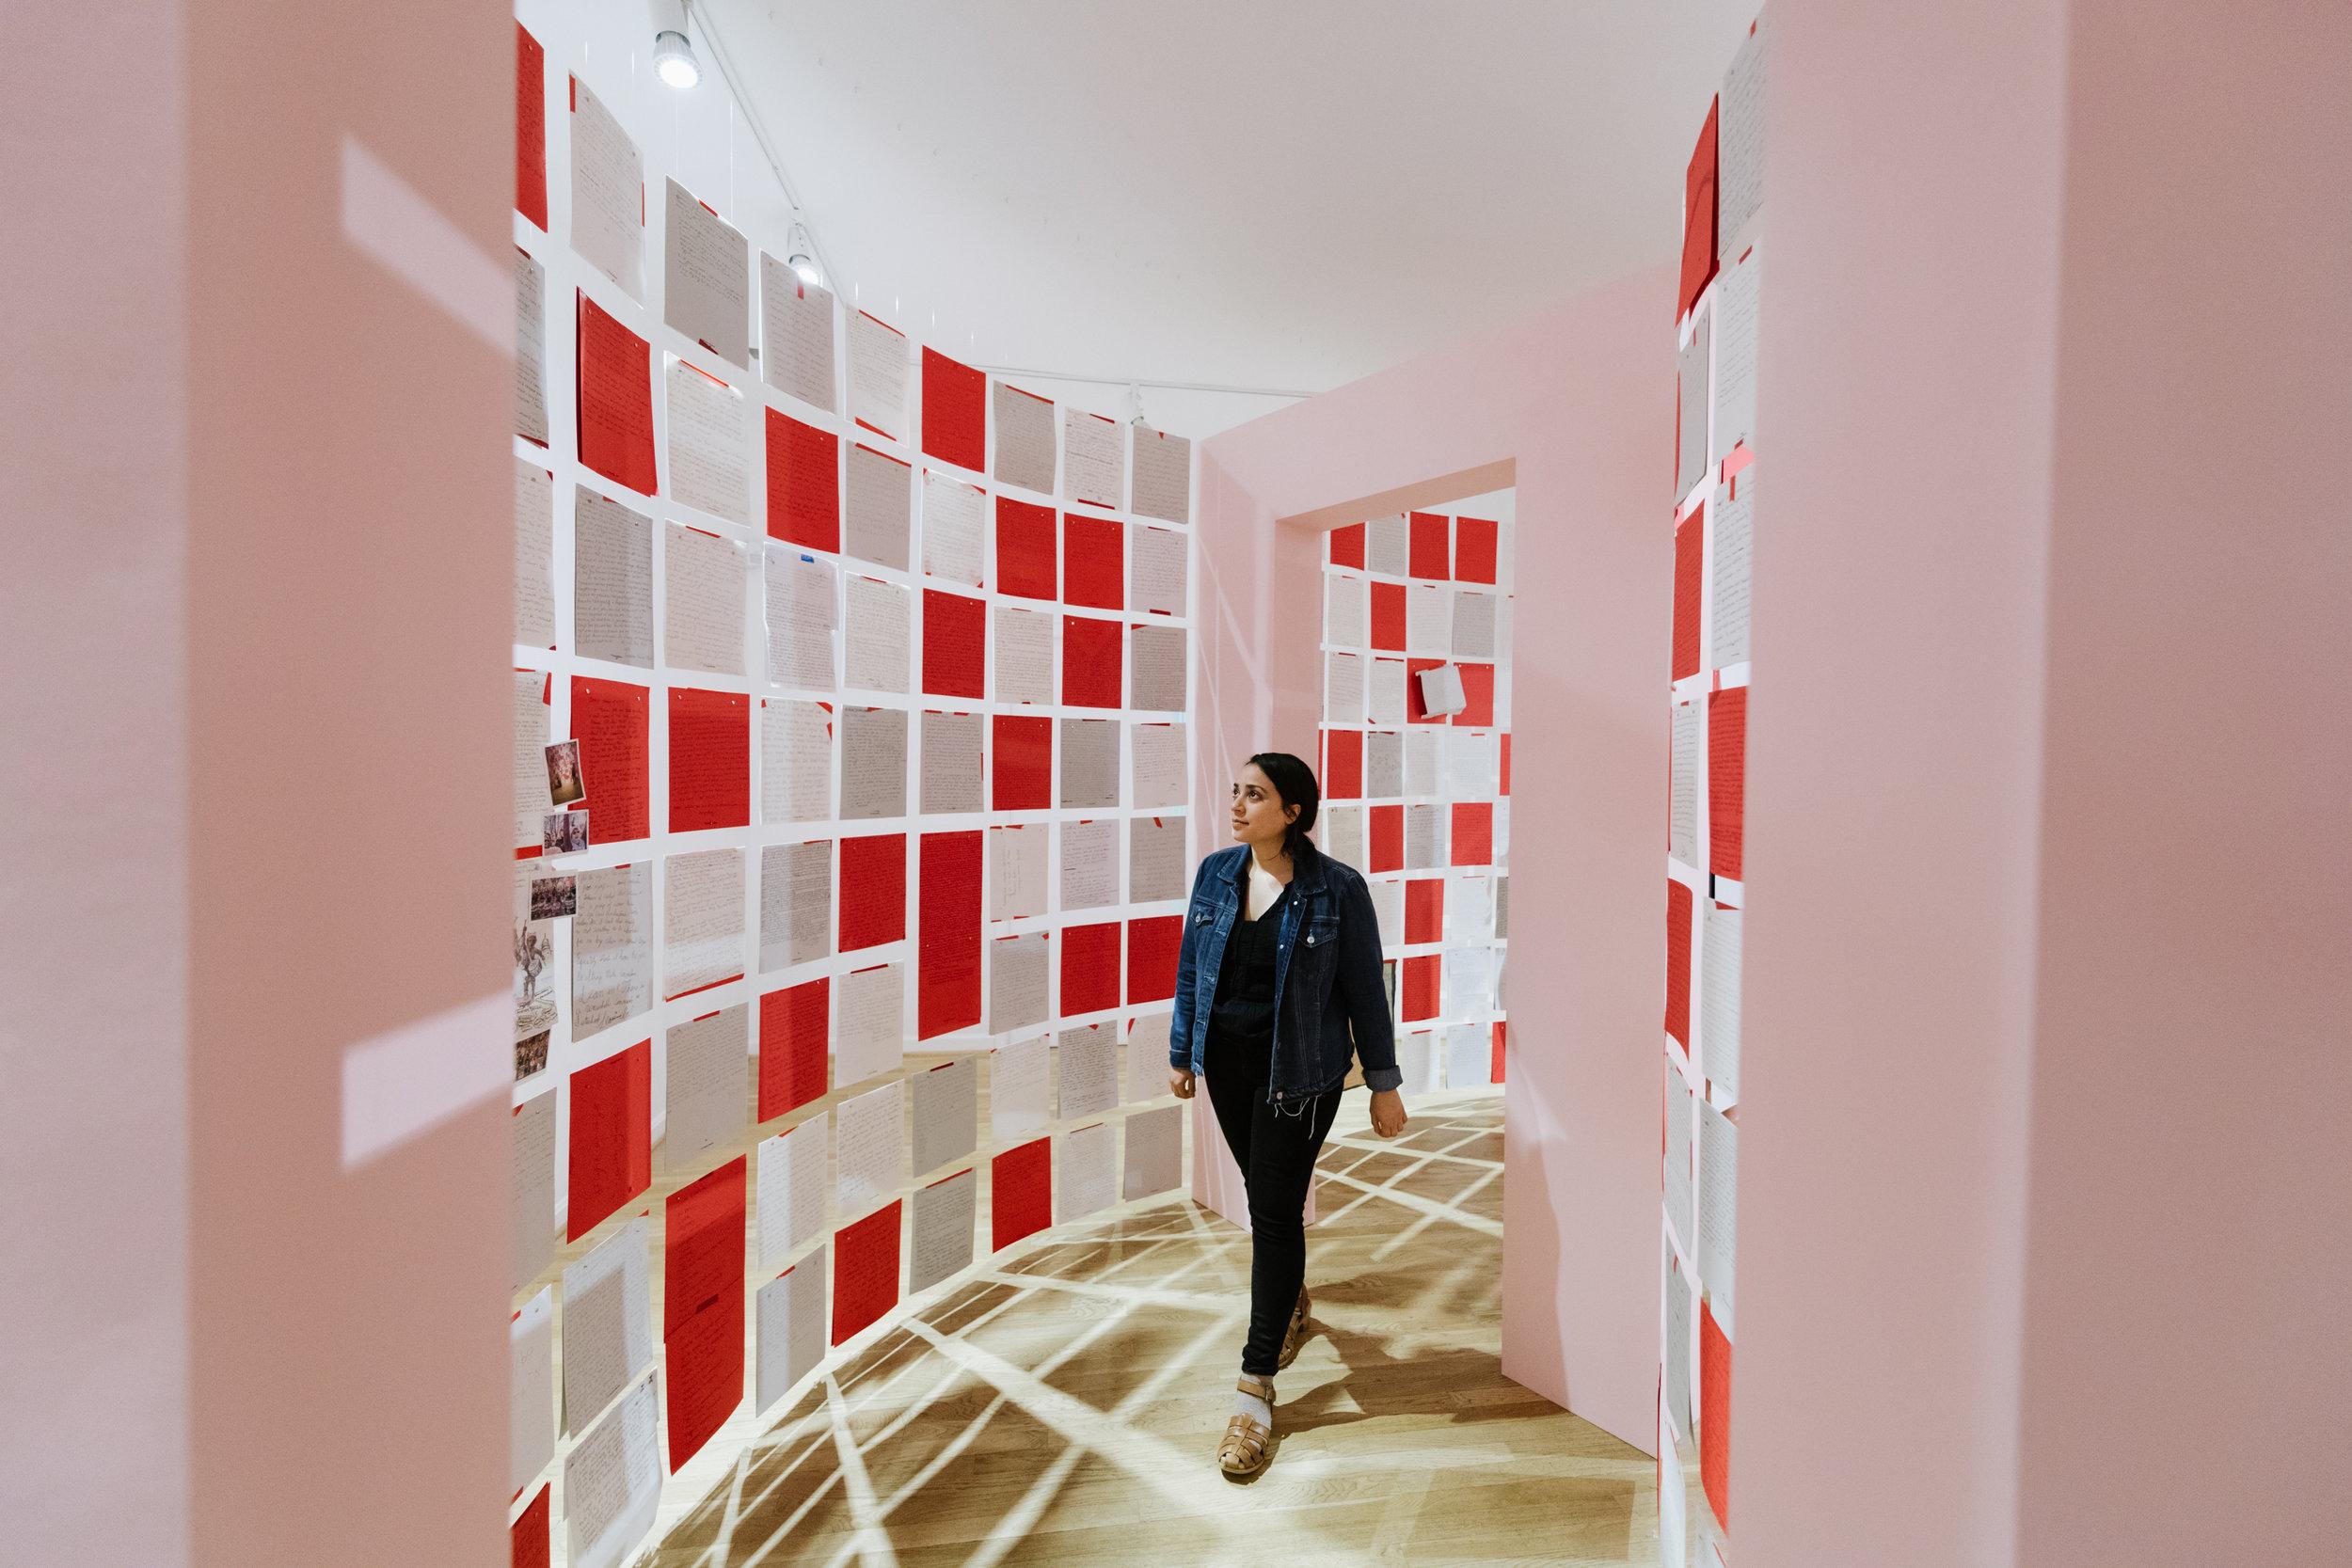 Installation view at Hillyer Art Space, Washington, DC